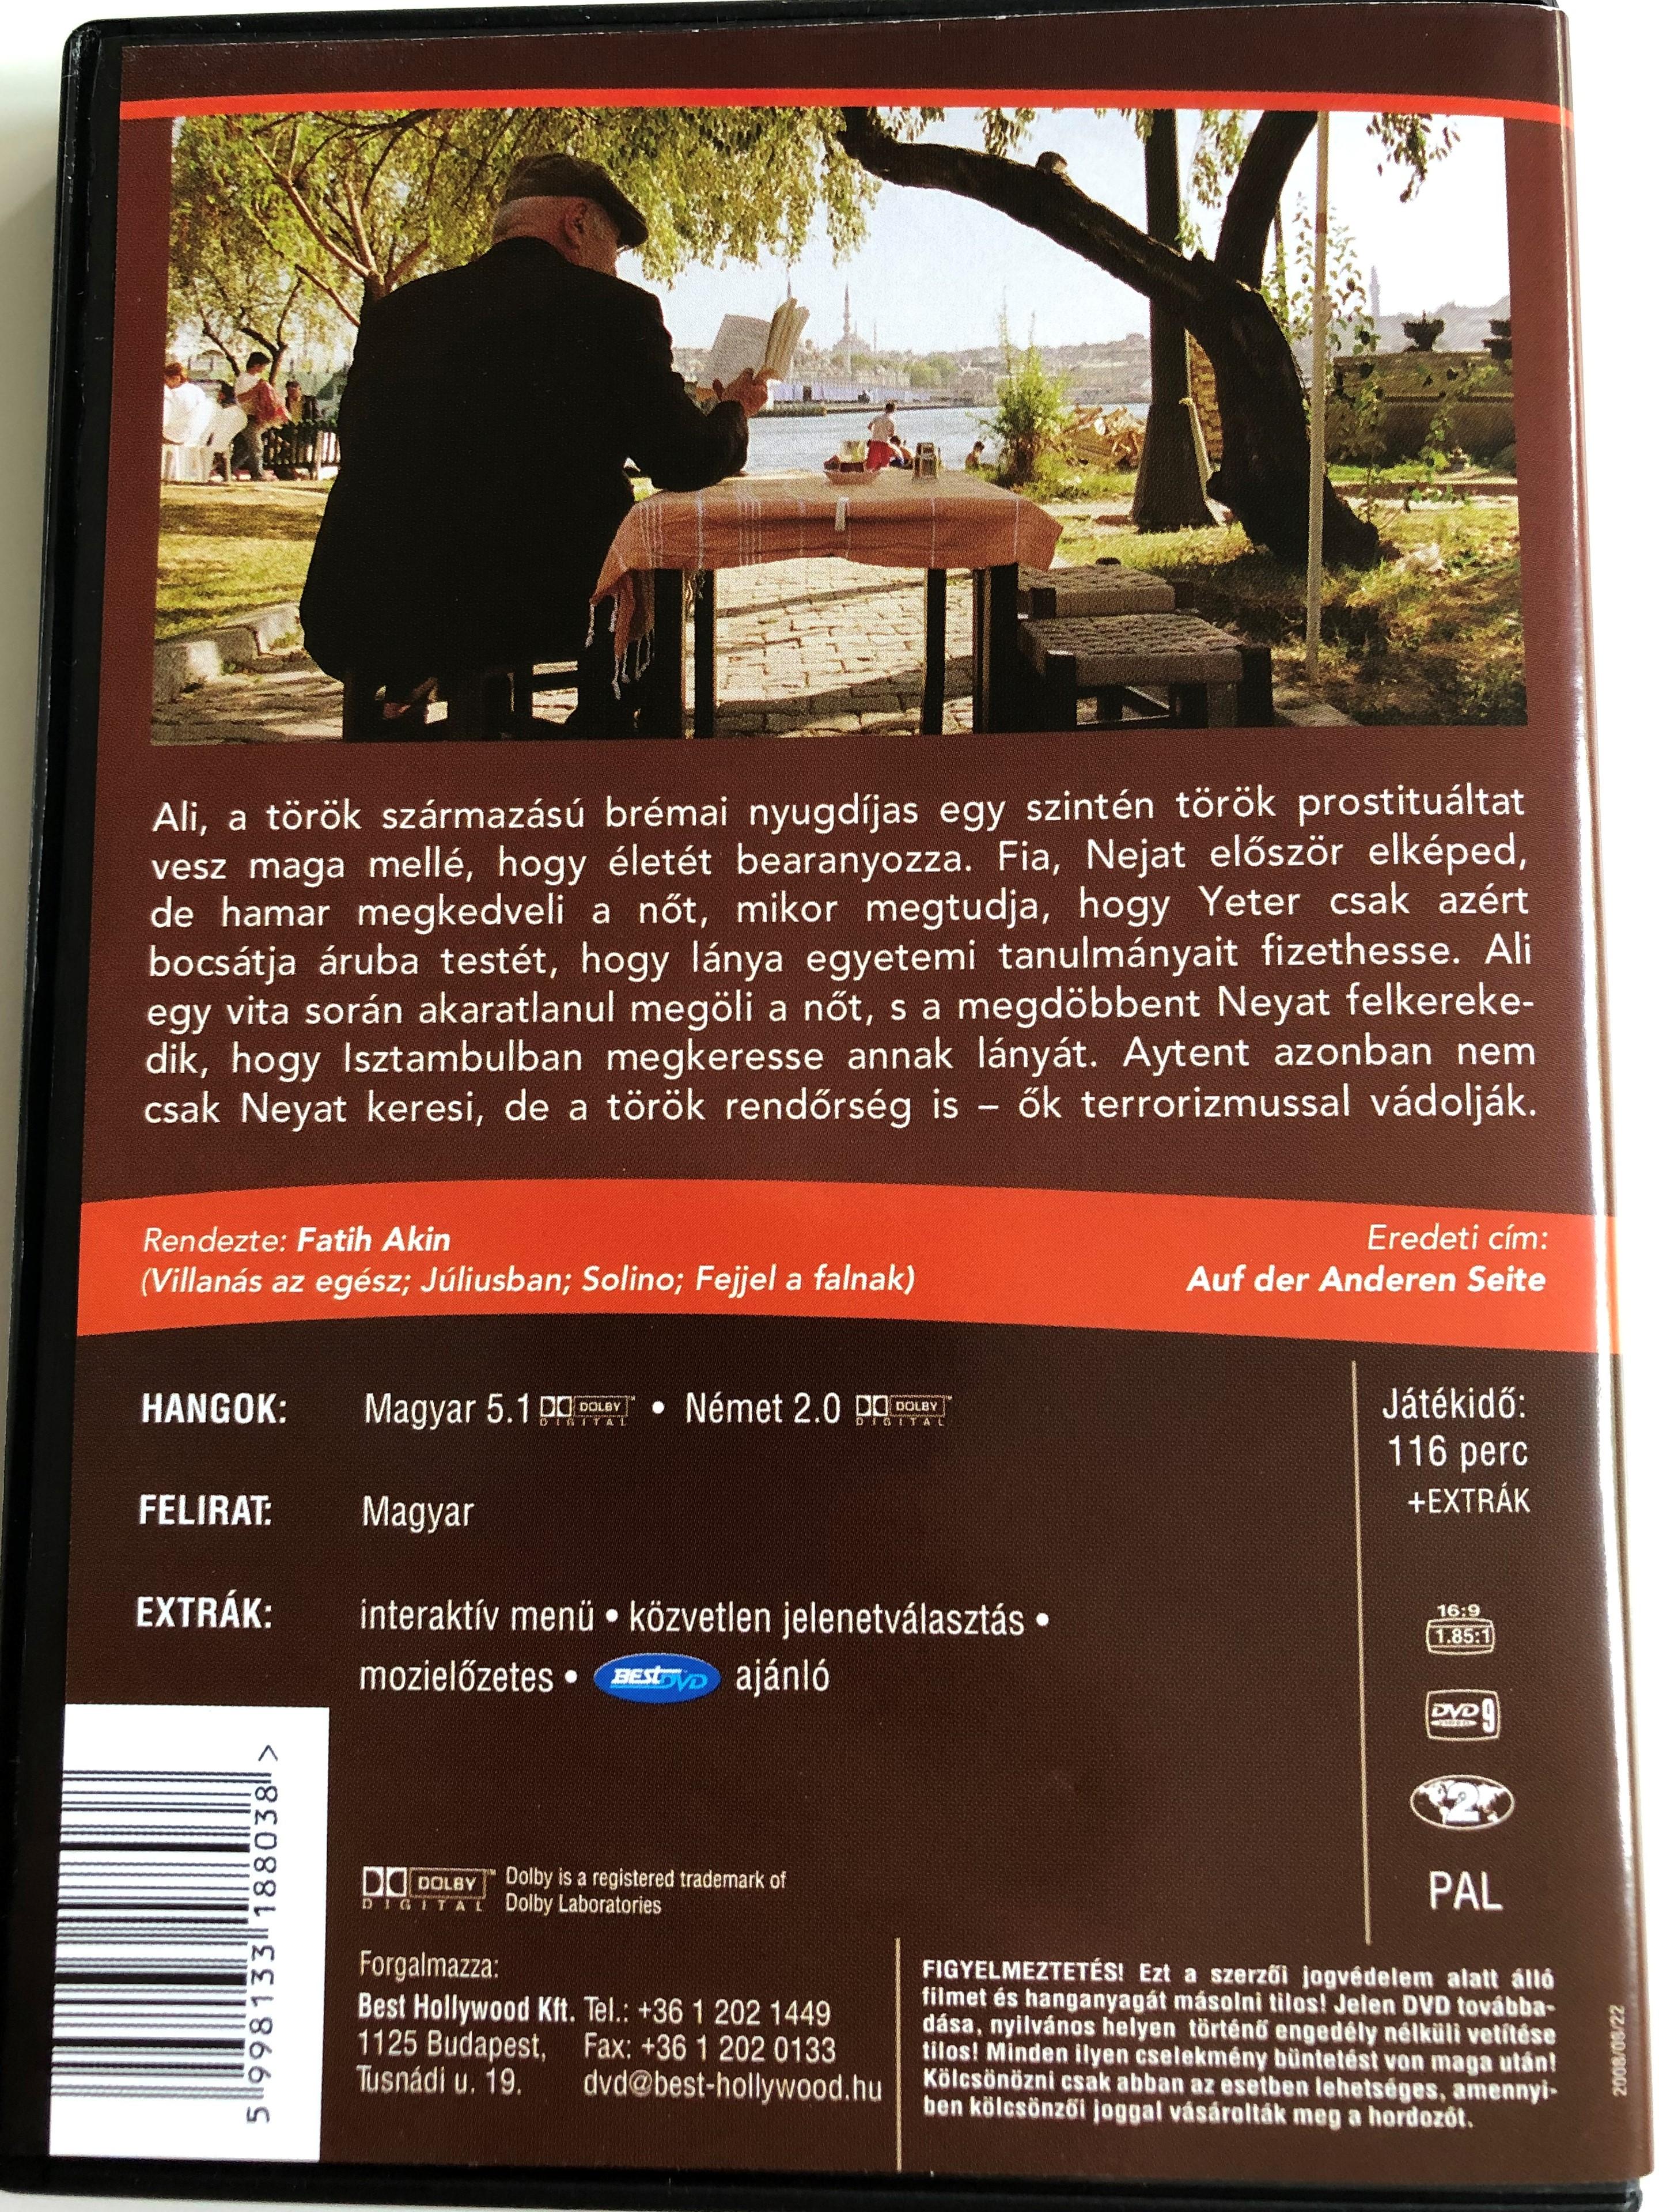 auf-der-anderen-seite-dvd-2007-a-m-sik-oldalon-the-edge-of-heaven-directed-by-fatih-ak-n-starring-baki-davrak-murg-l-yesilcay-patrycia-ziolkowska-hanna-schygulla-2-.jpg